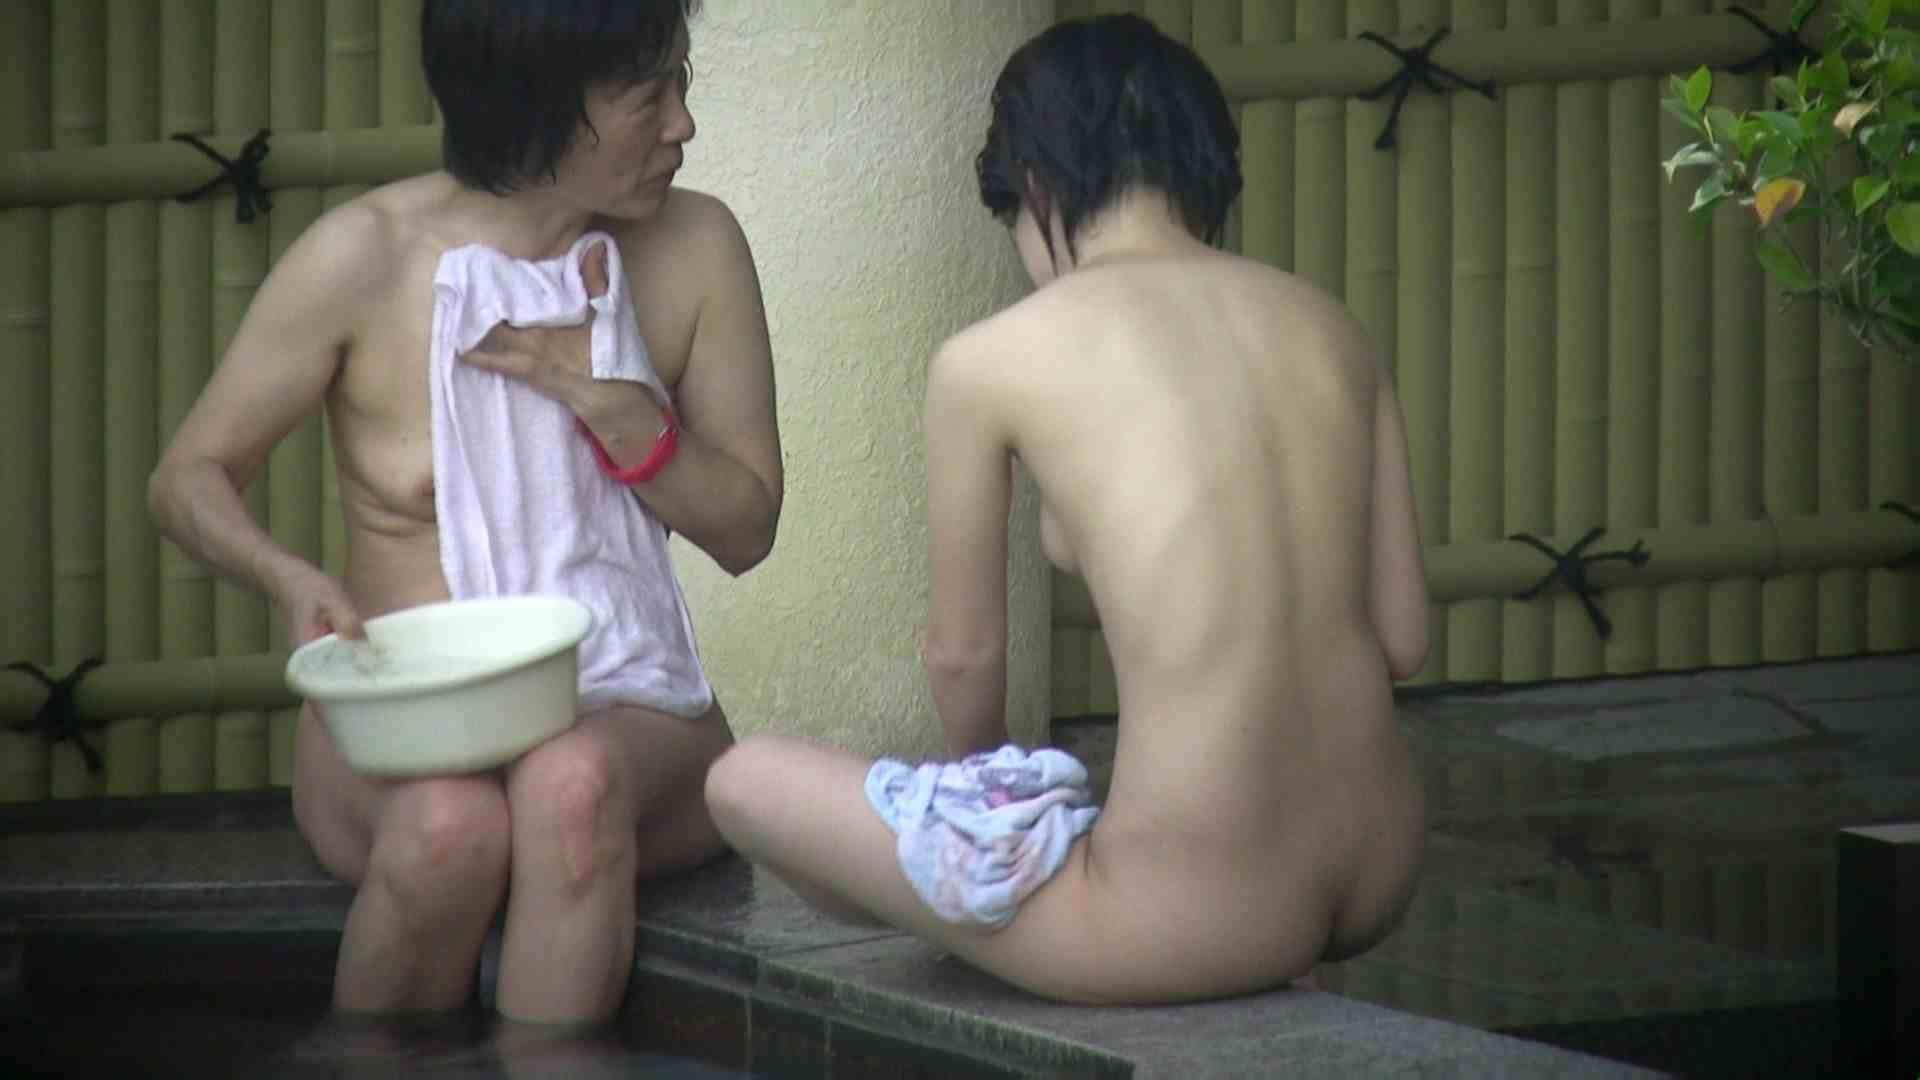 Aquaな露天風呂Vol.06【VIP】 HなOL | 盗撮  86pic 5